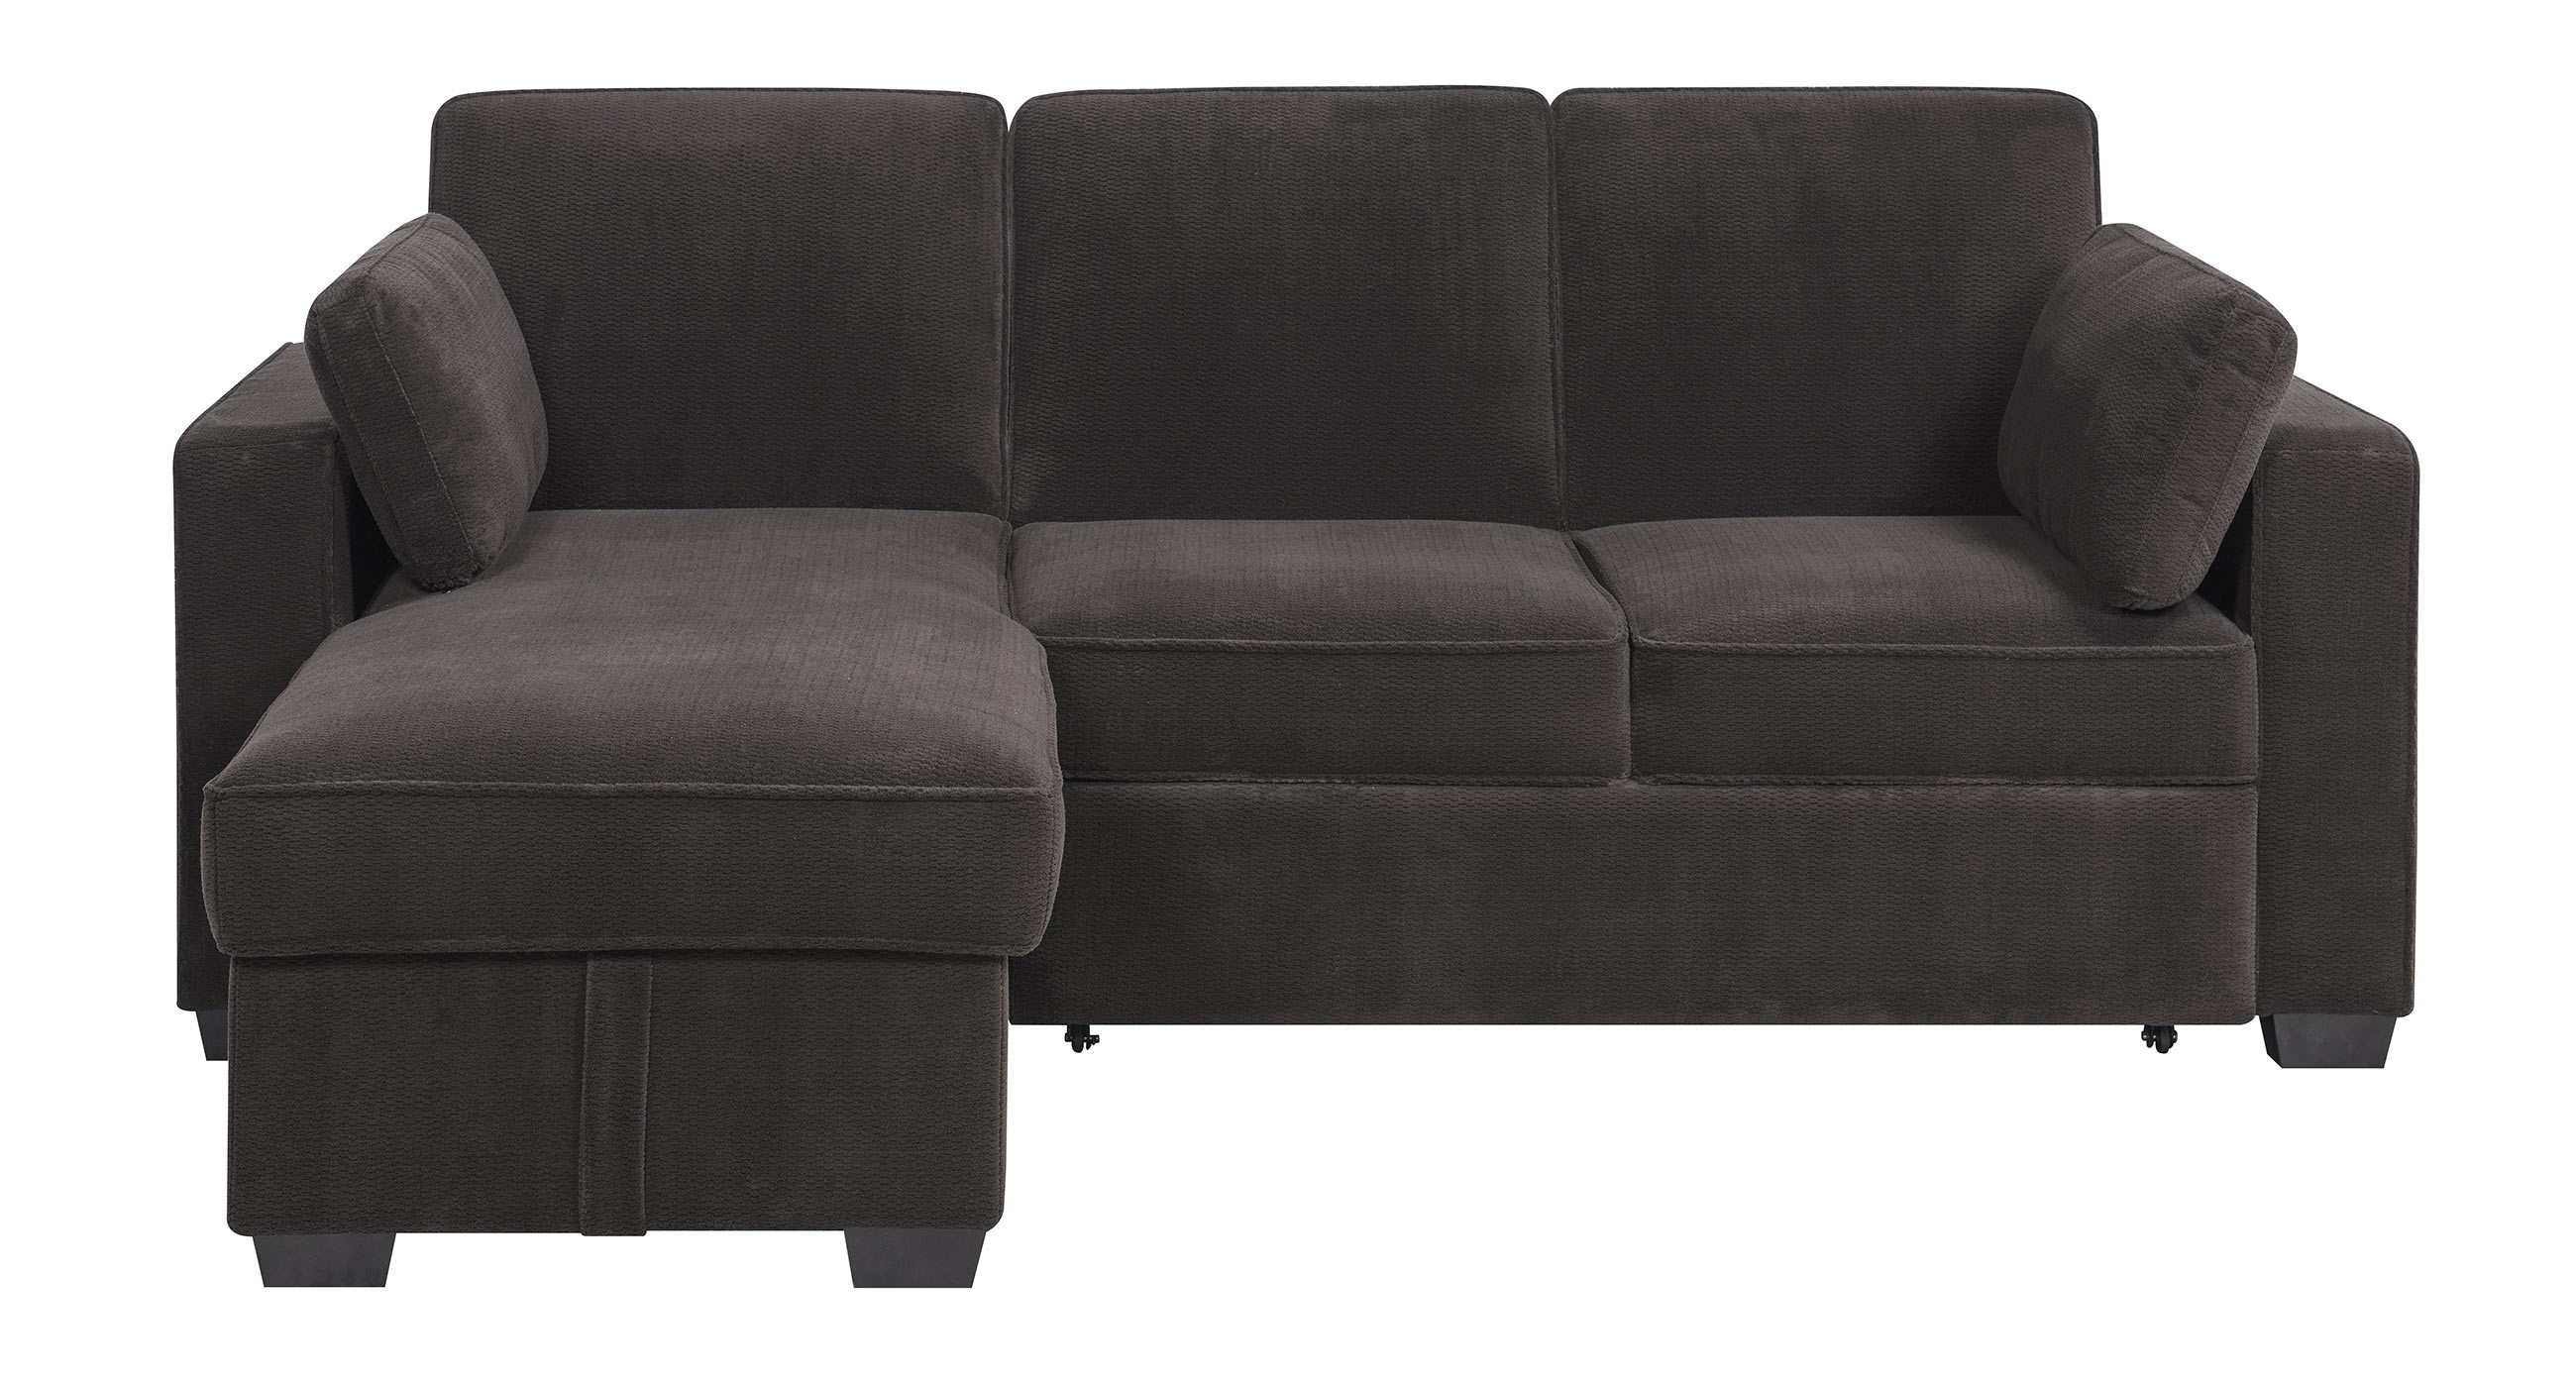 Chaela Sectional Convertible Sofa Dark Greyserta / Lifestyle With Regard To Convertible Sofas (View 9 of 10)